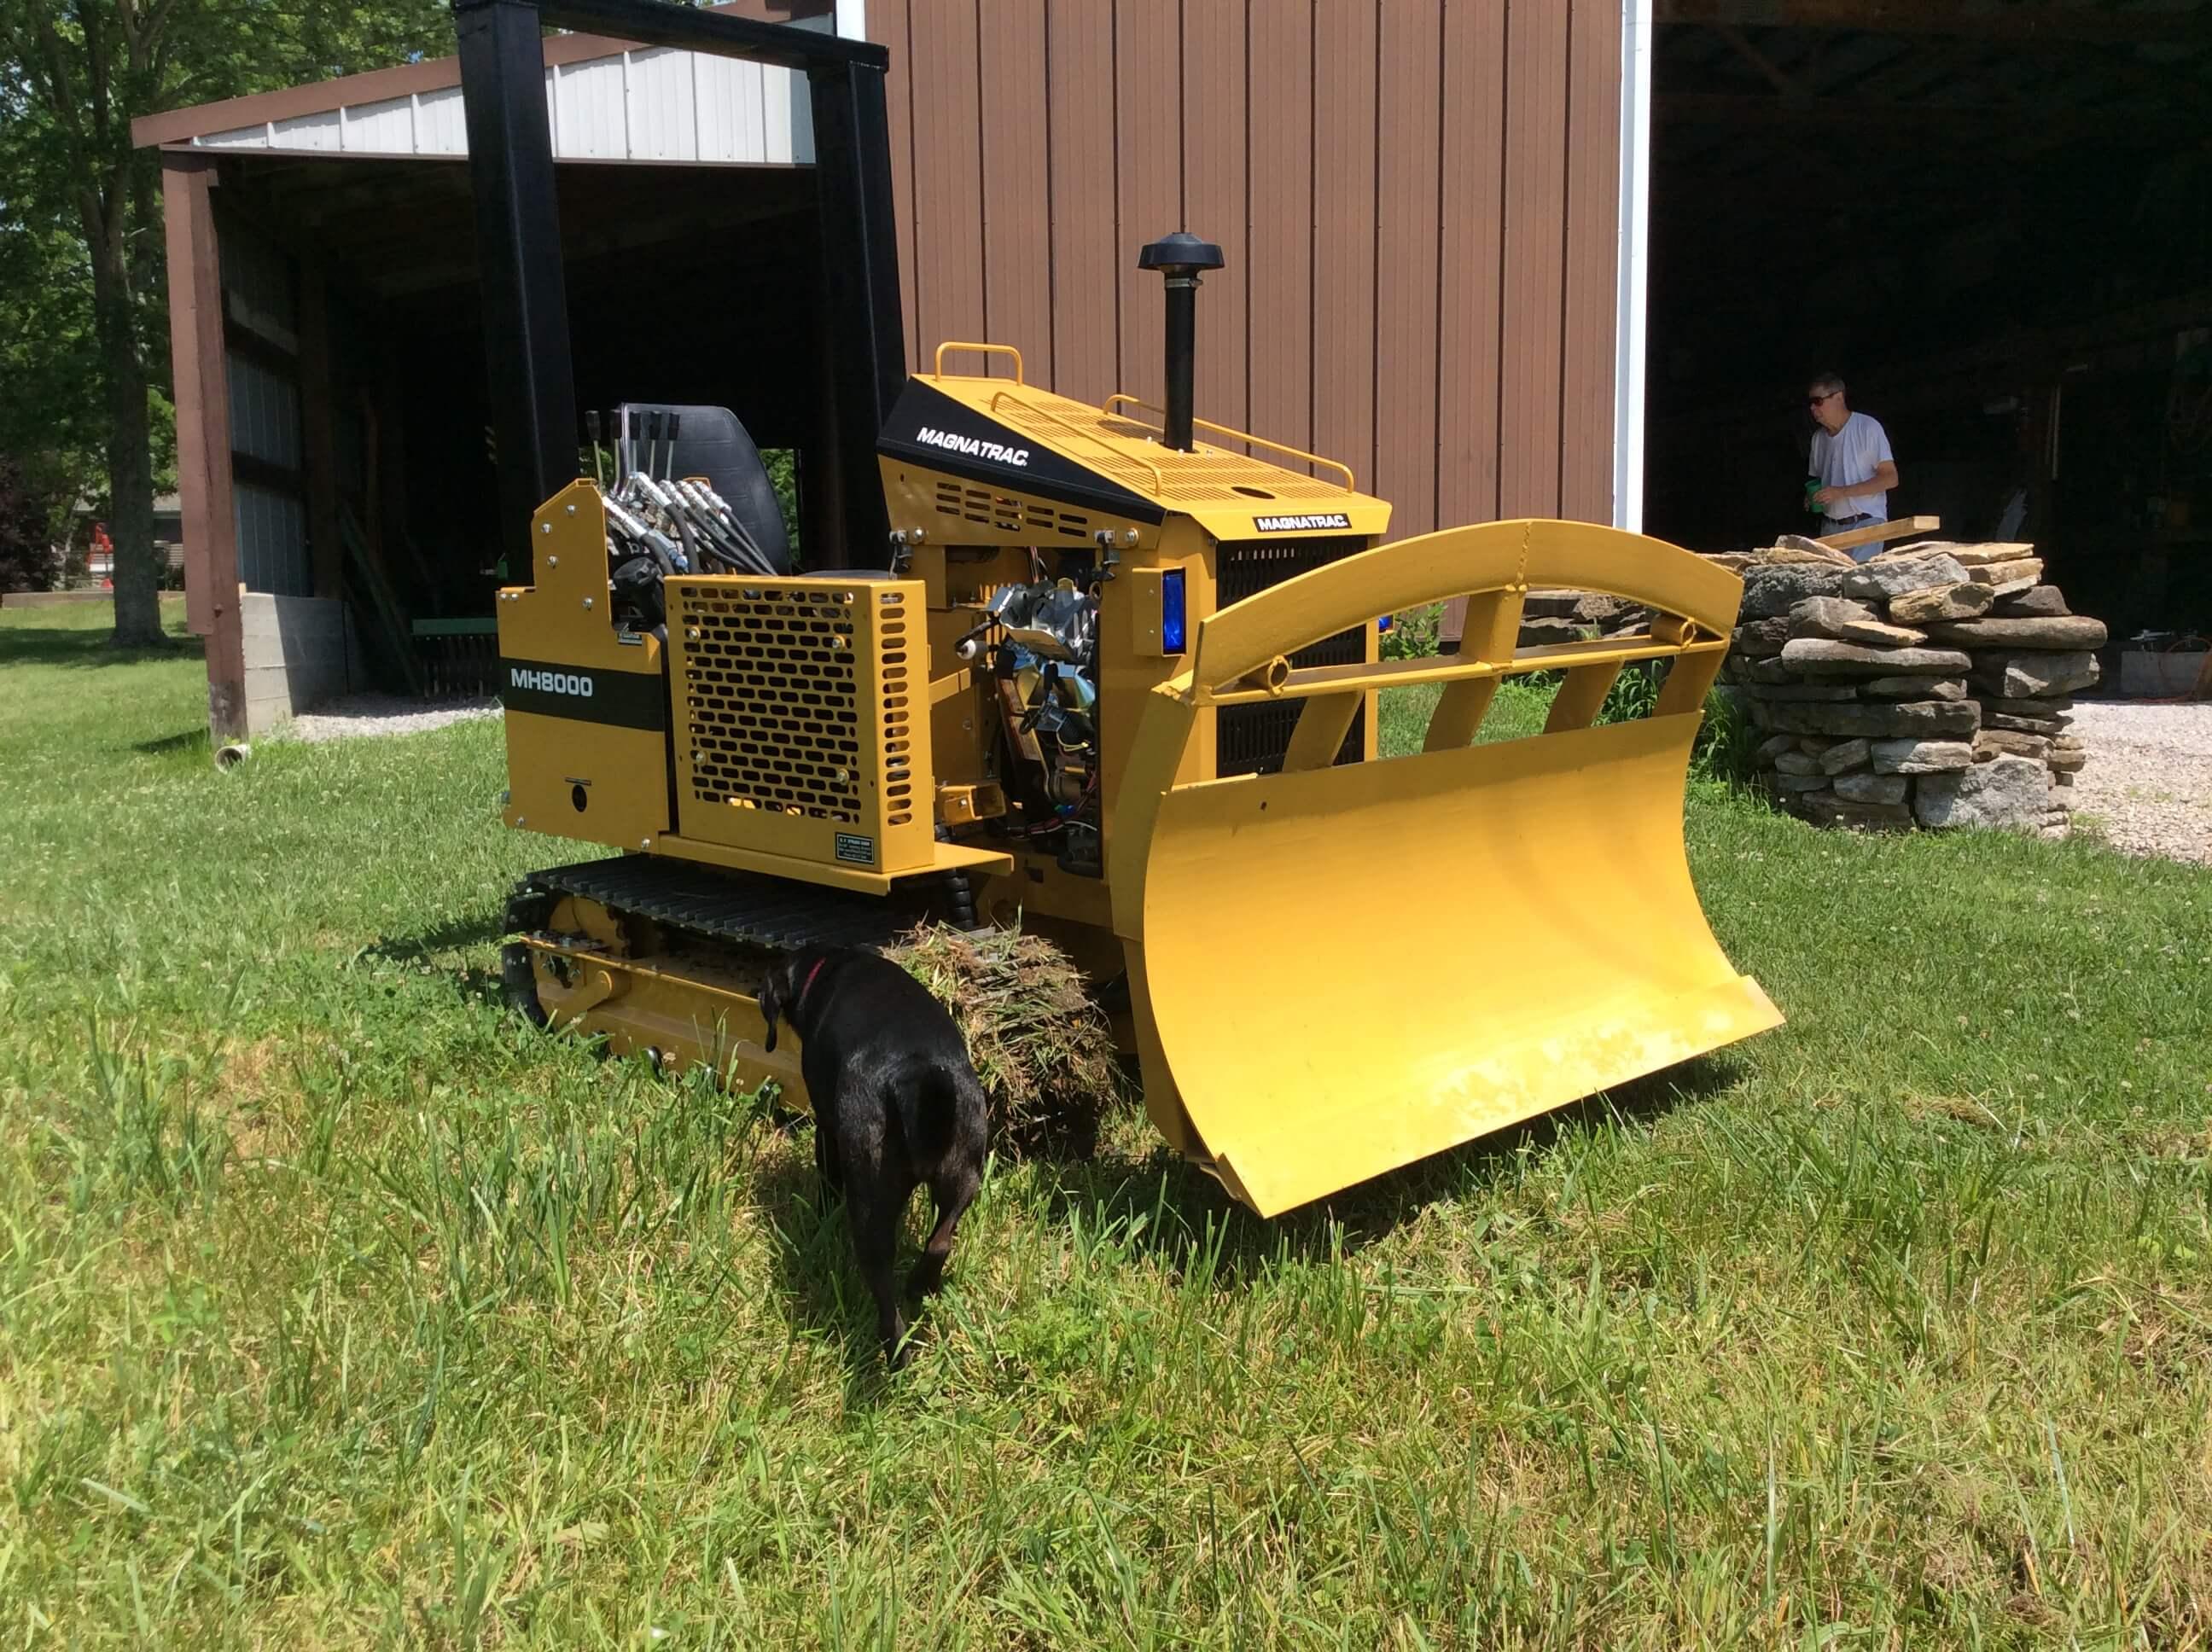 MAGNATRAC Owner Customizes His Small Bulldozer - Struck Corp